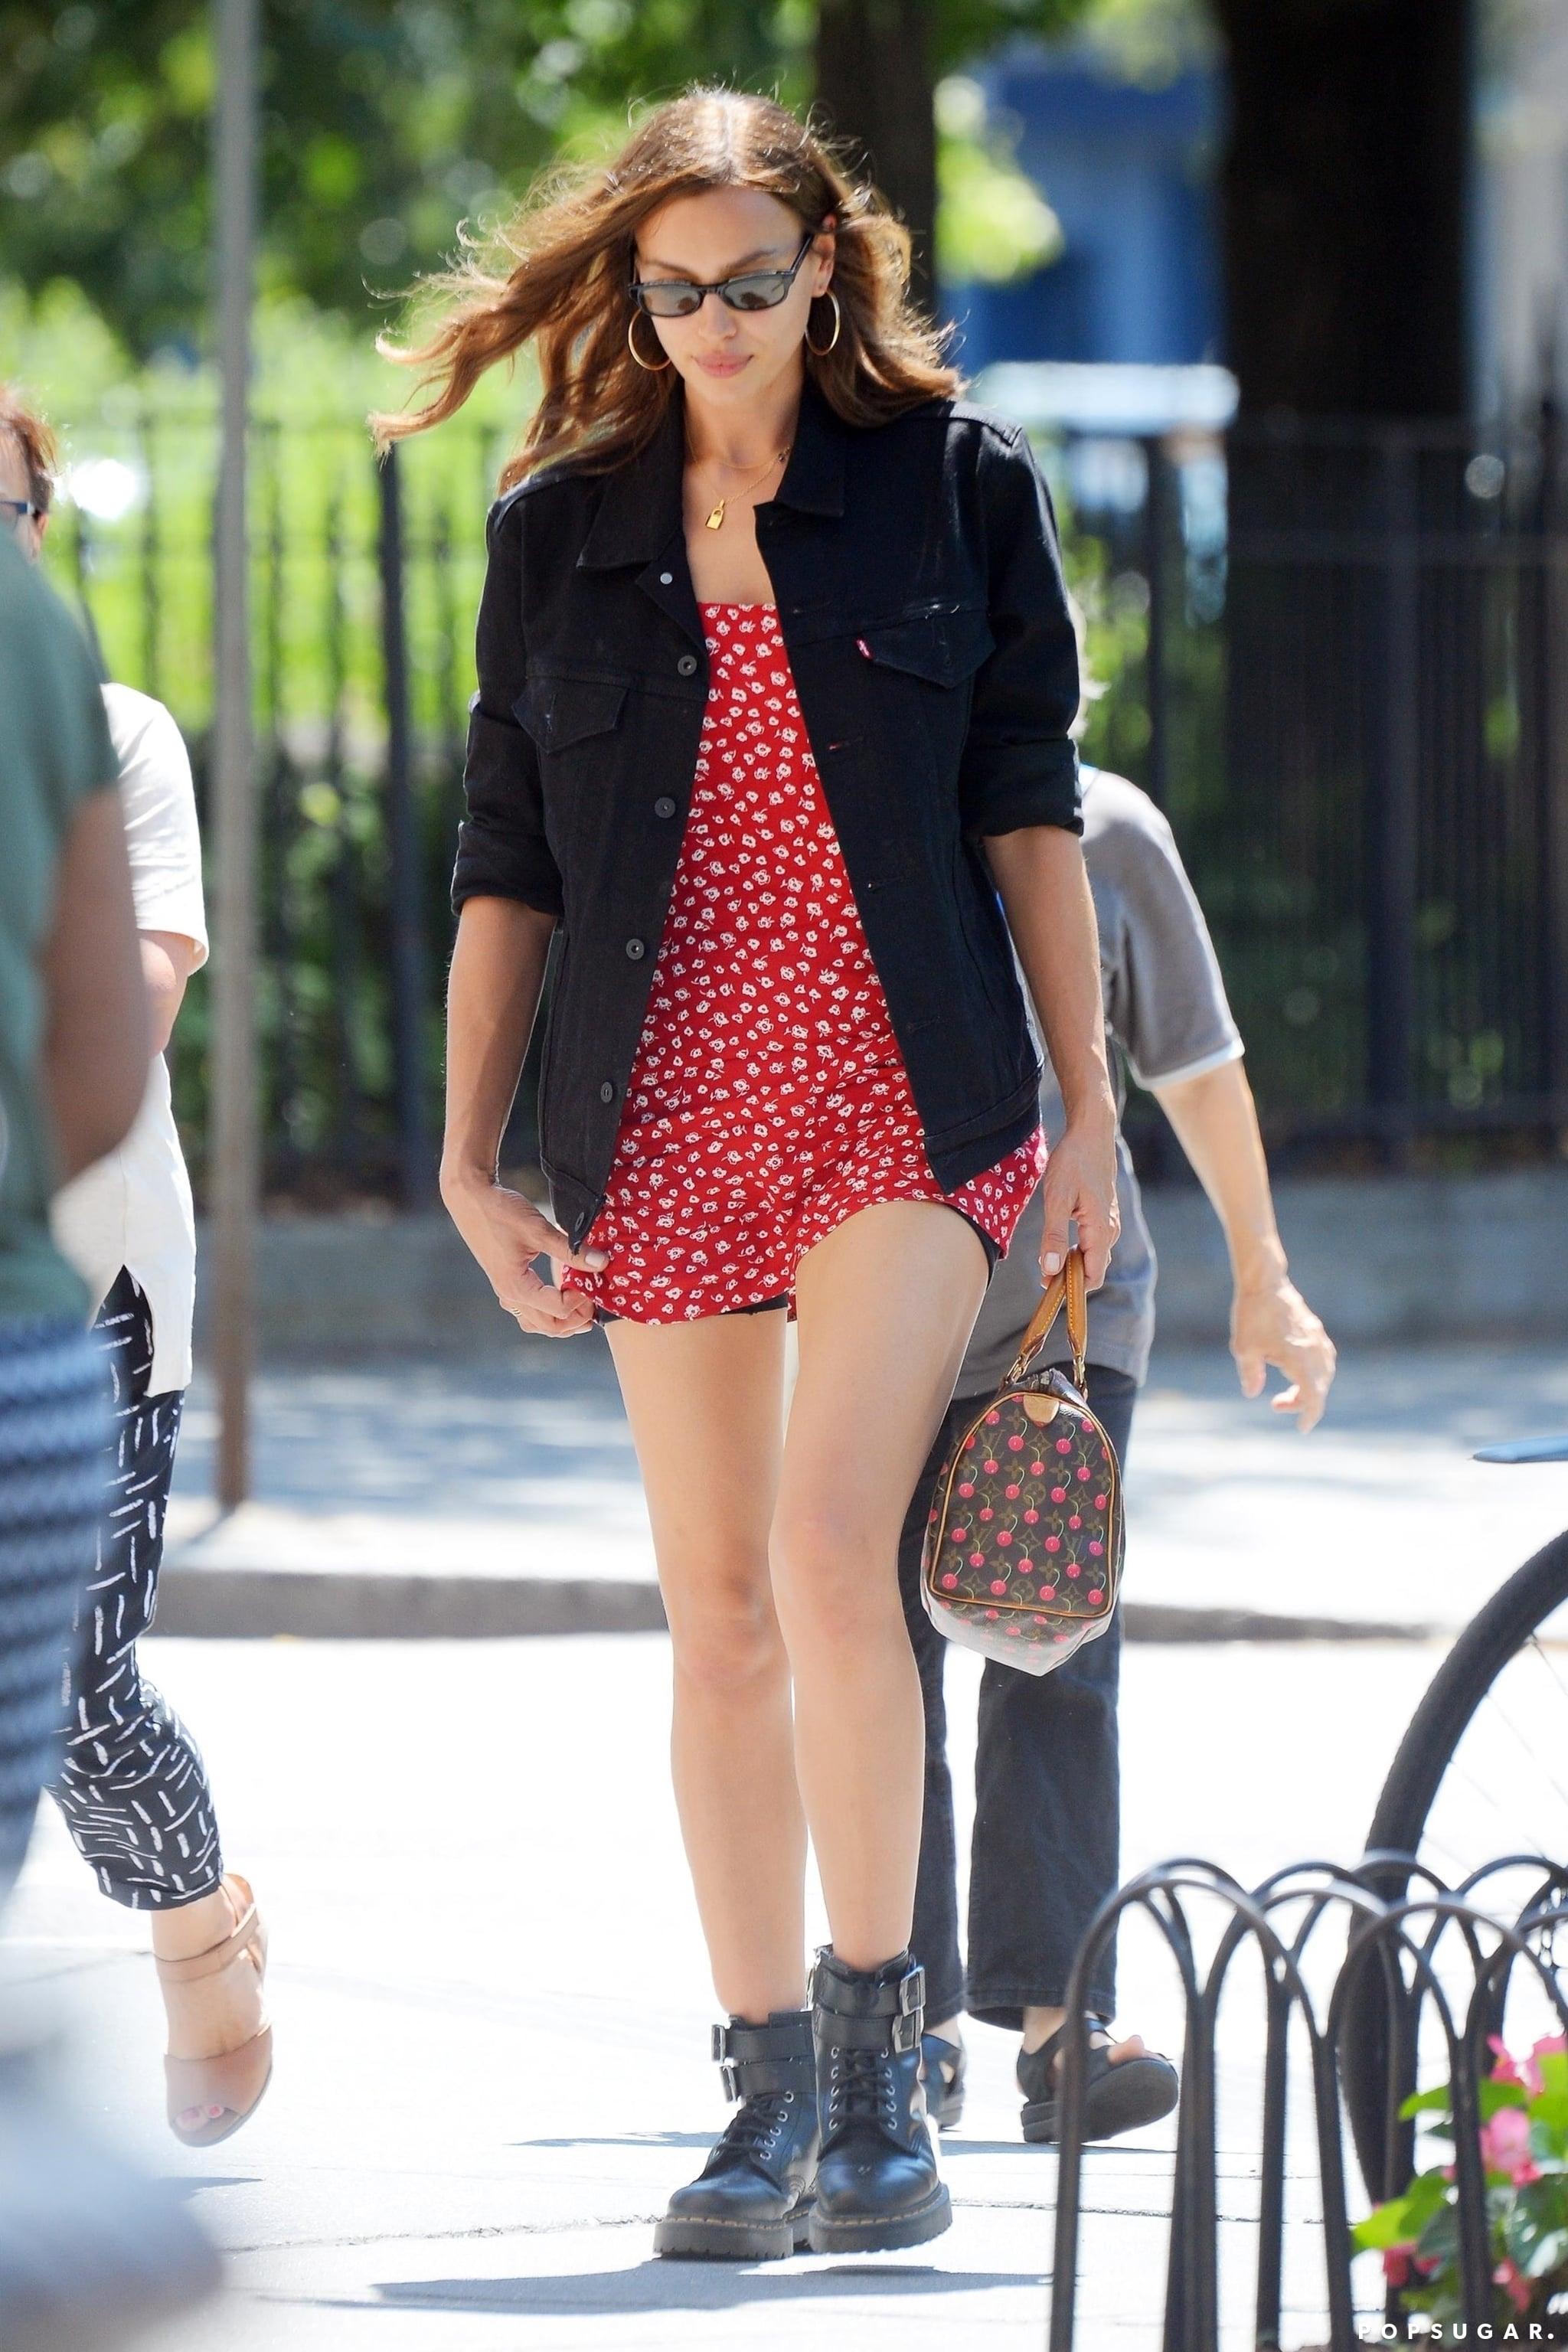 Beyonce Spirit Music Video Outfits Popsugar Fashion